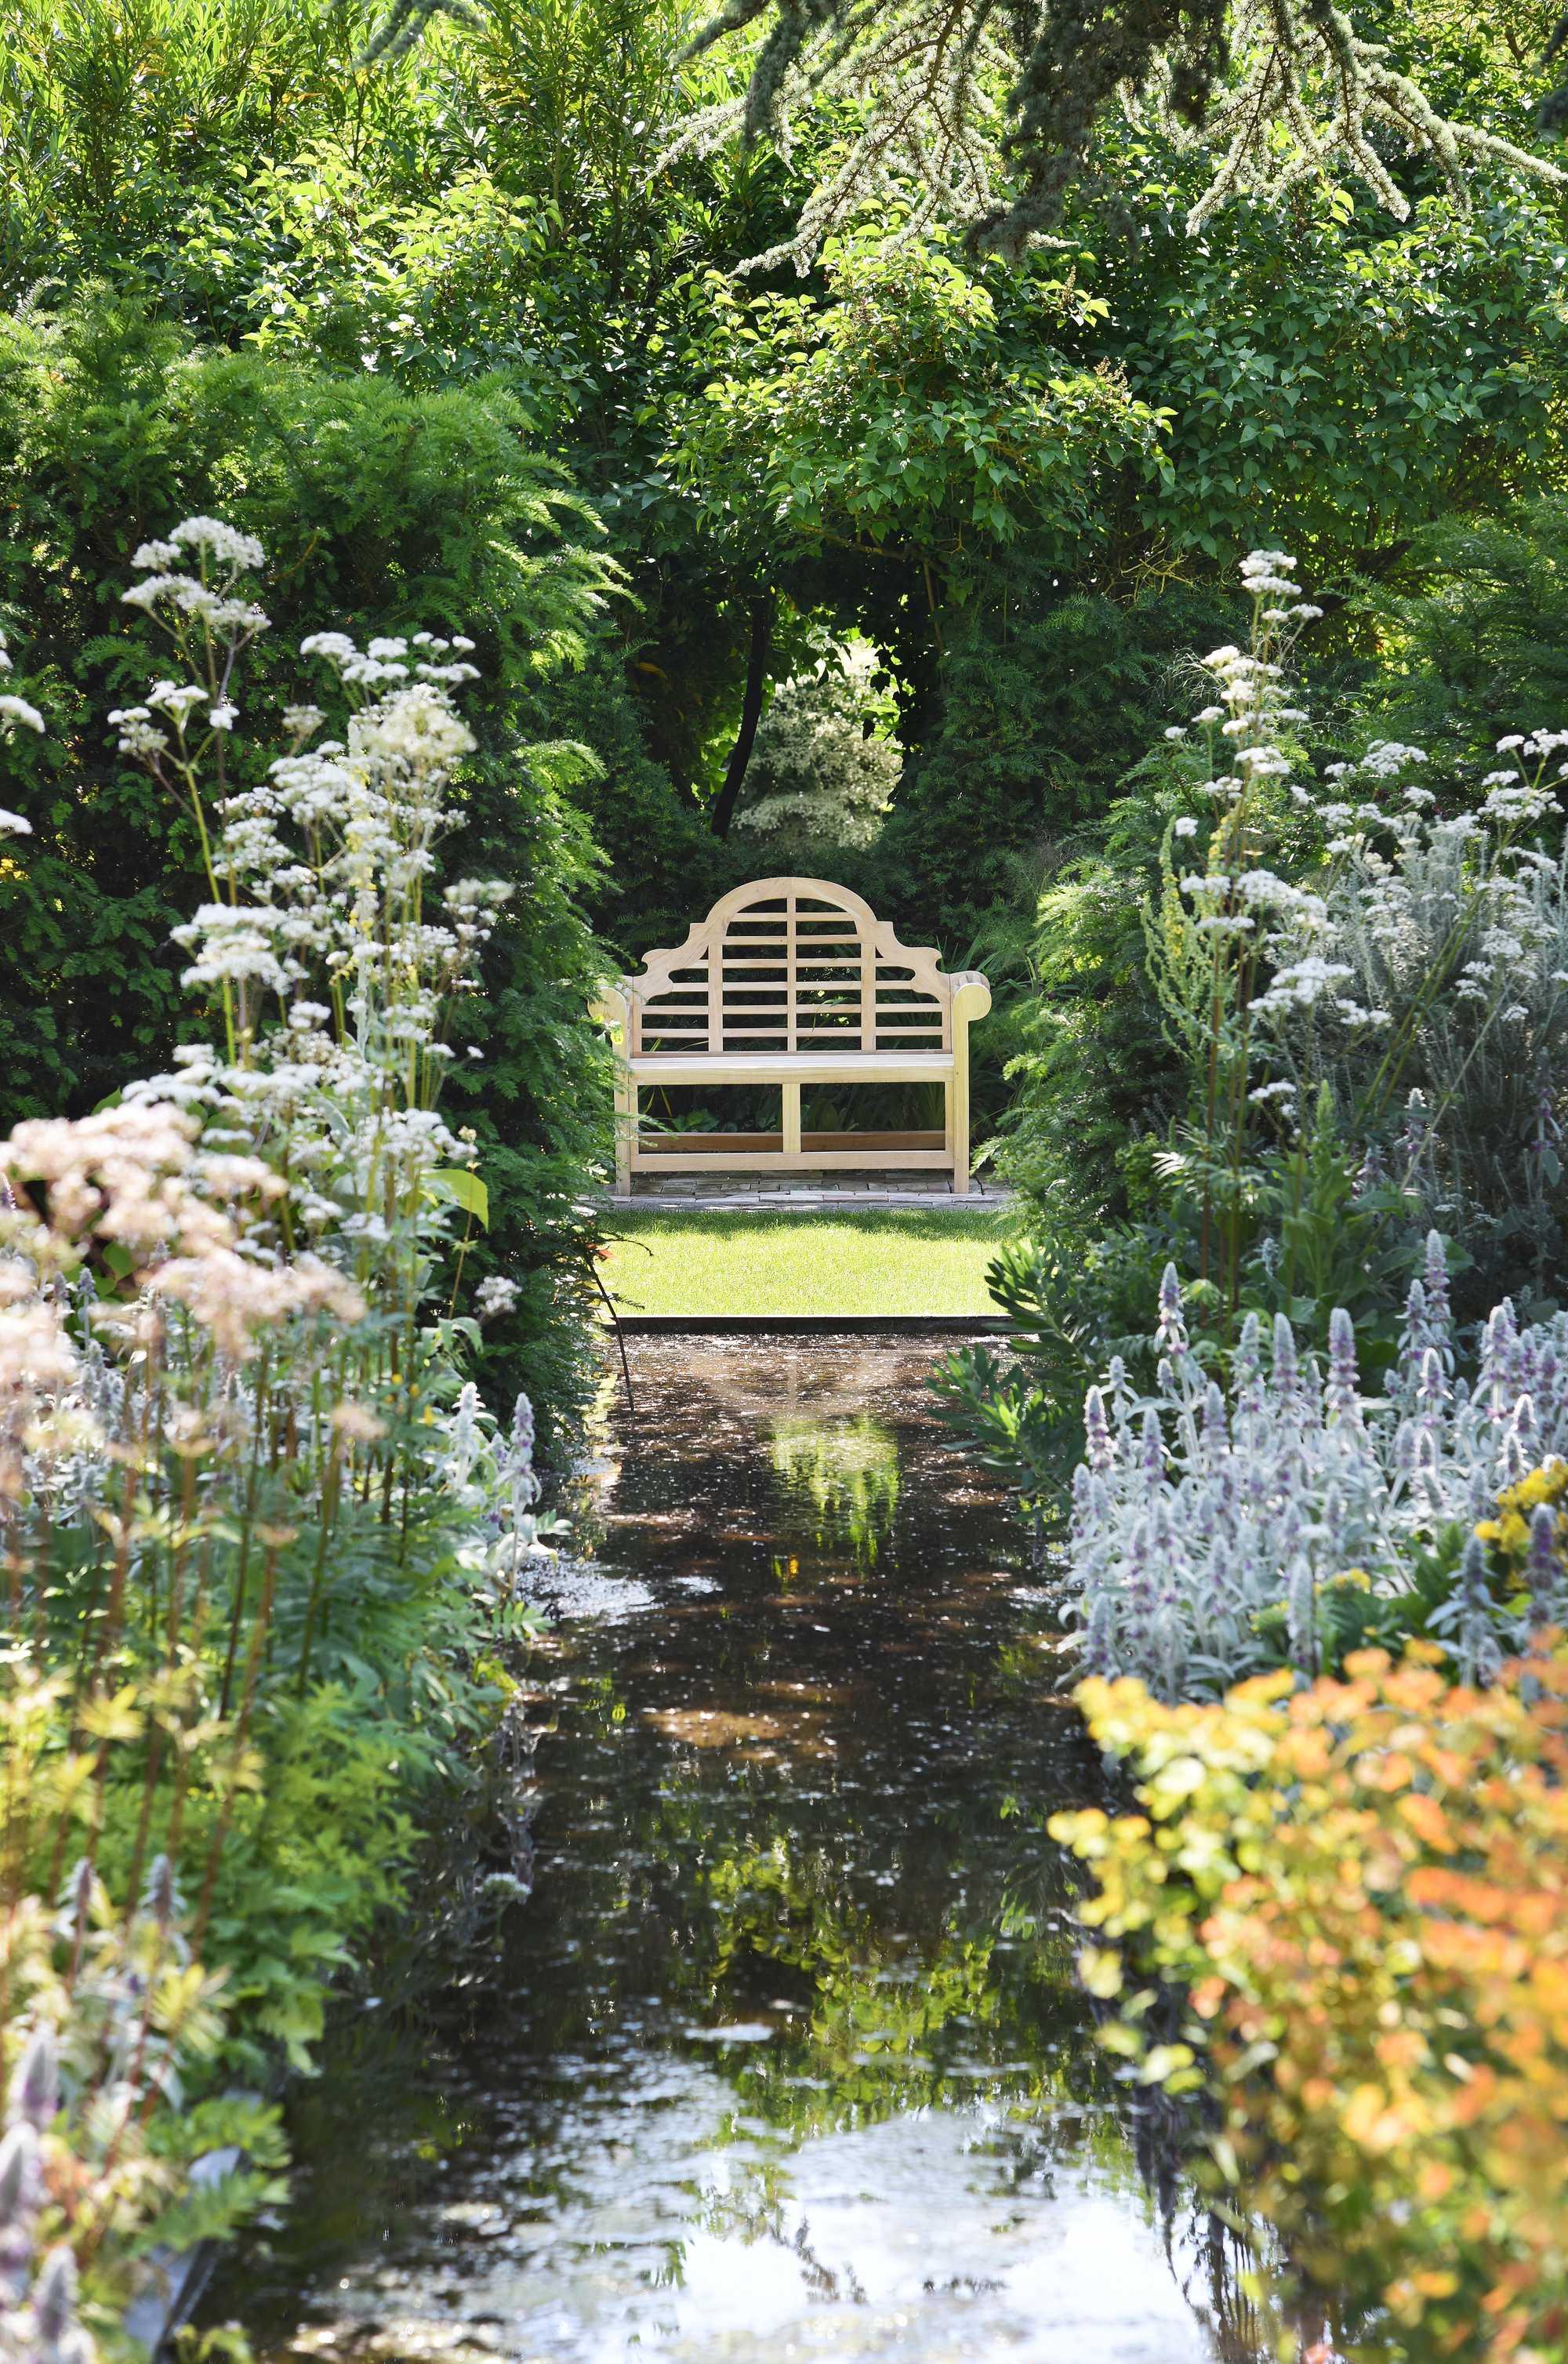 tuinen landelijke stijl 0118 calais